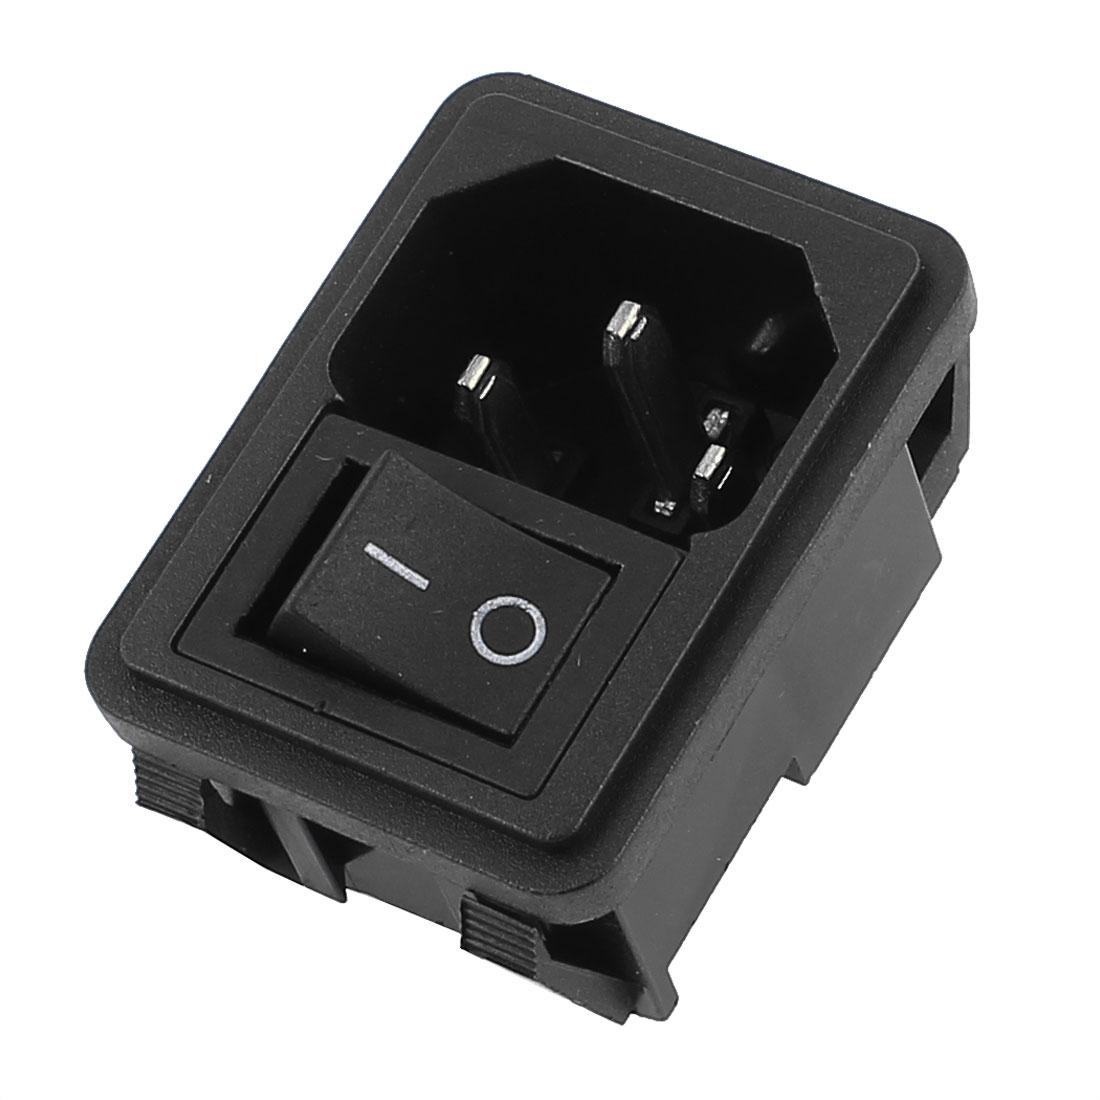 AC 250V 10A 4 Terminals Black On-Off Rocker Switch Inlet Power Socket